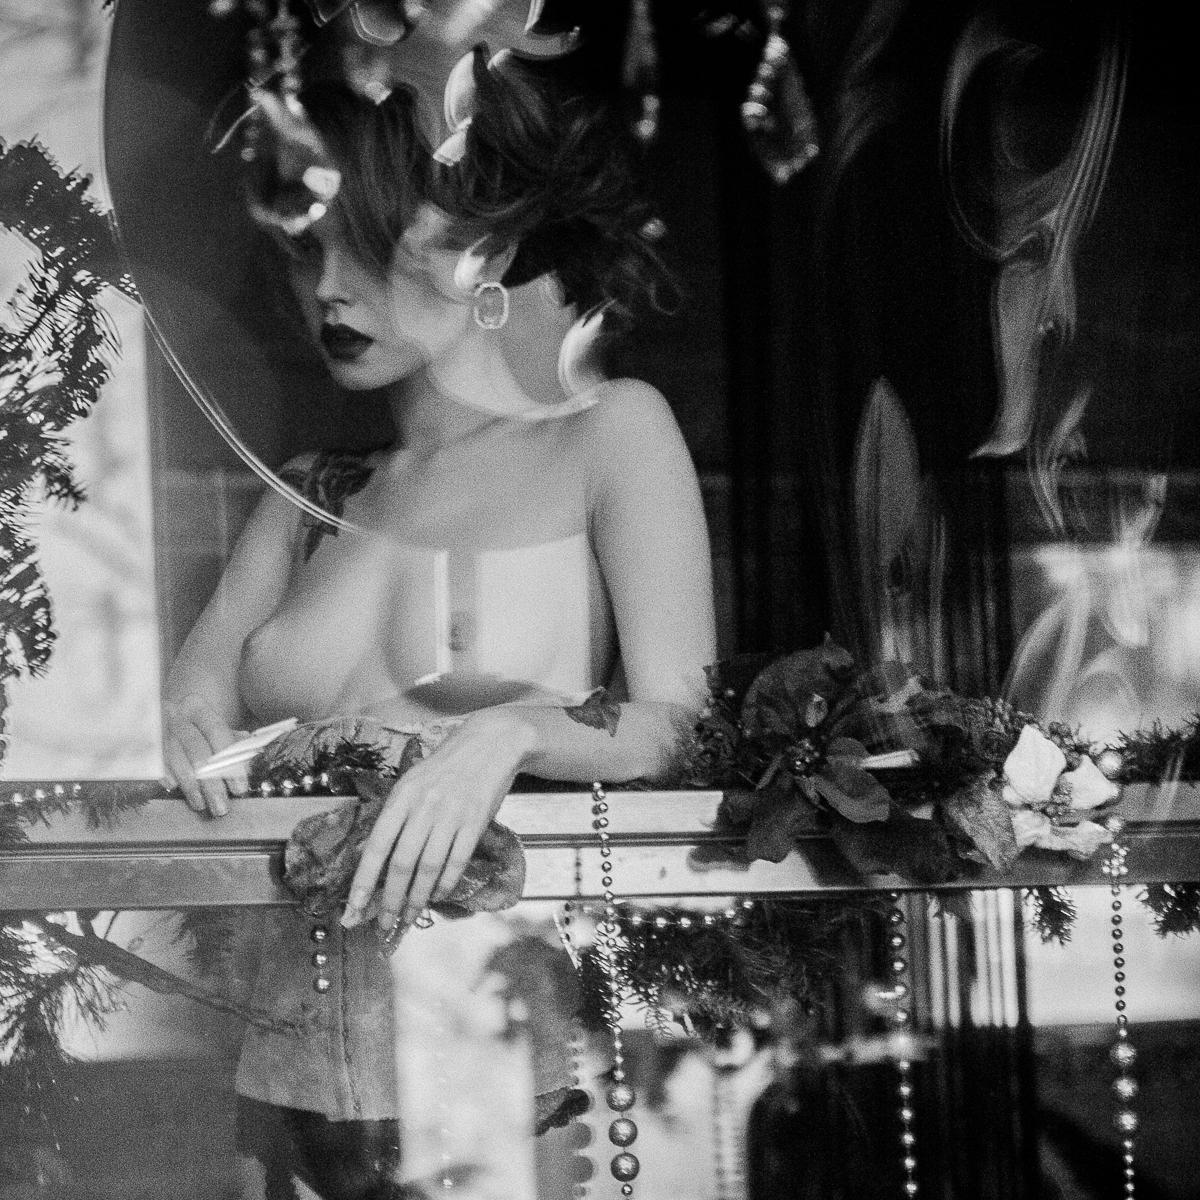 Анастасия Щеглова - Silent Night / Александр Прищепов